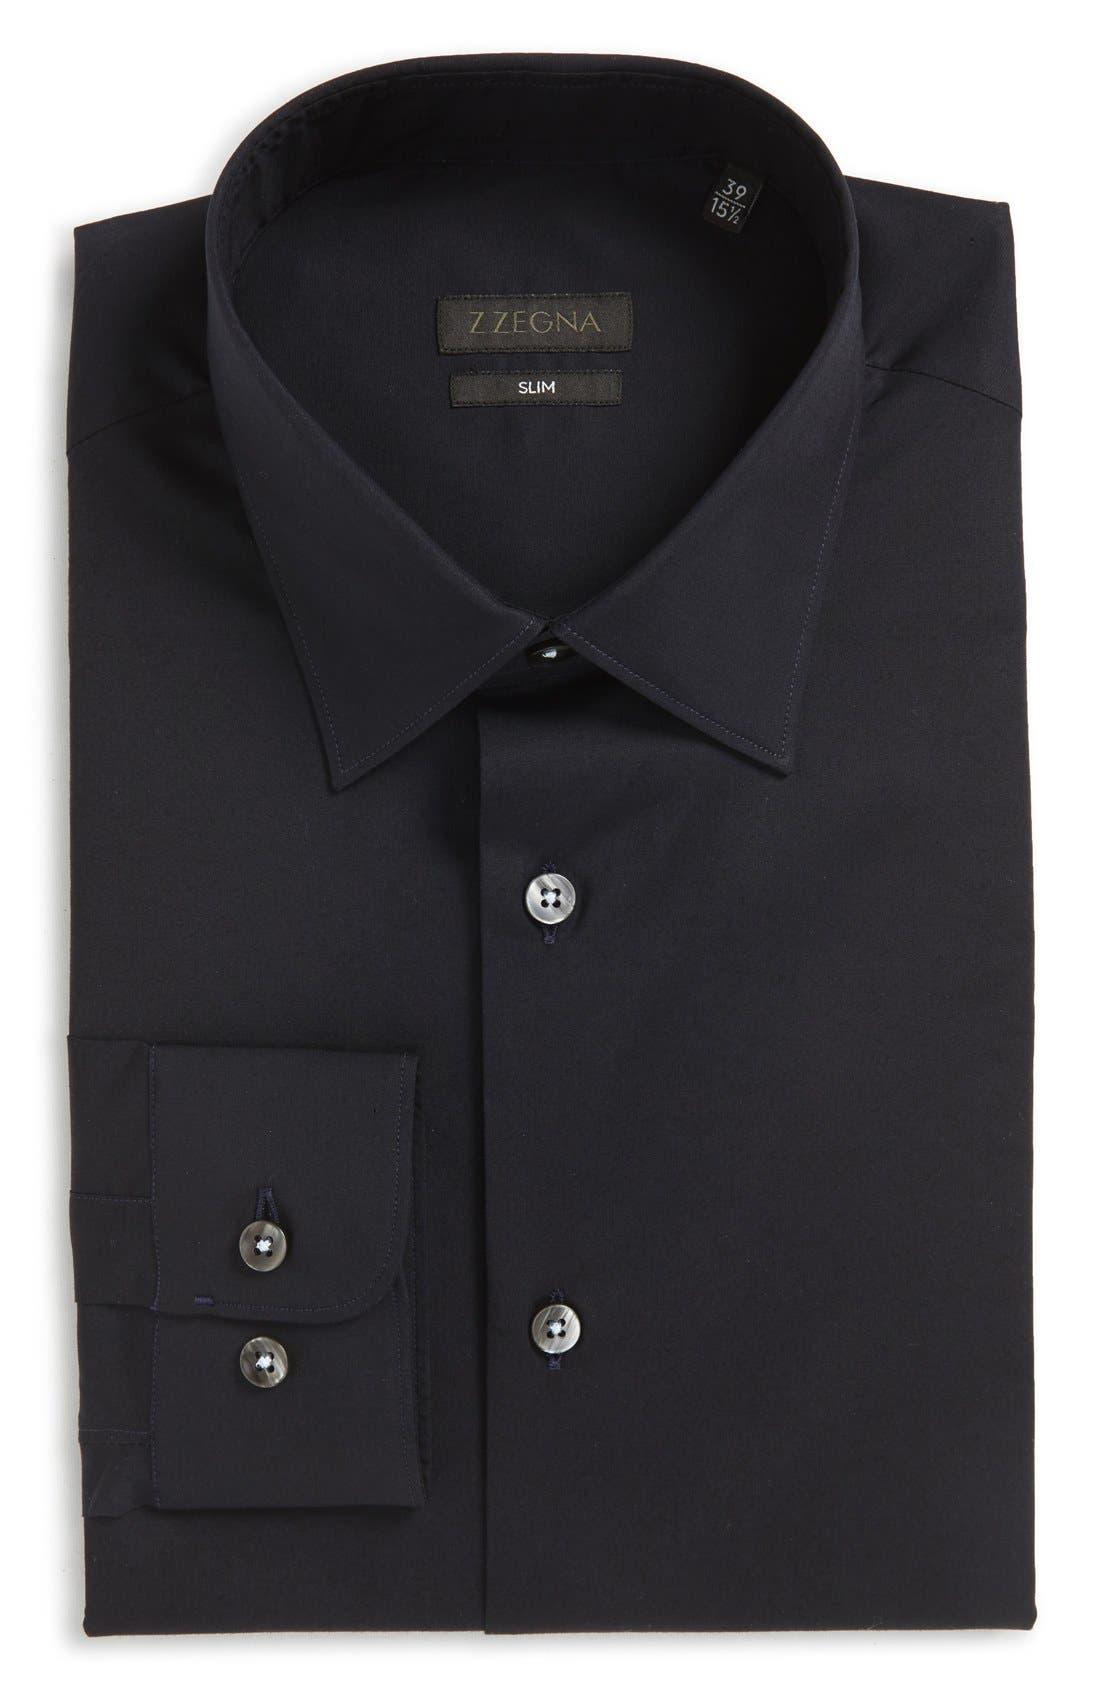 Alternate Image 1 Selected - Z Zegna Slim Fit Solid Stretch Dress Shirt